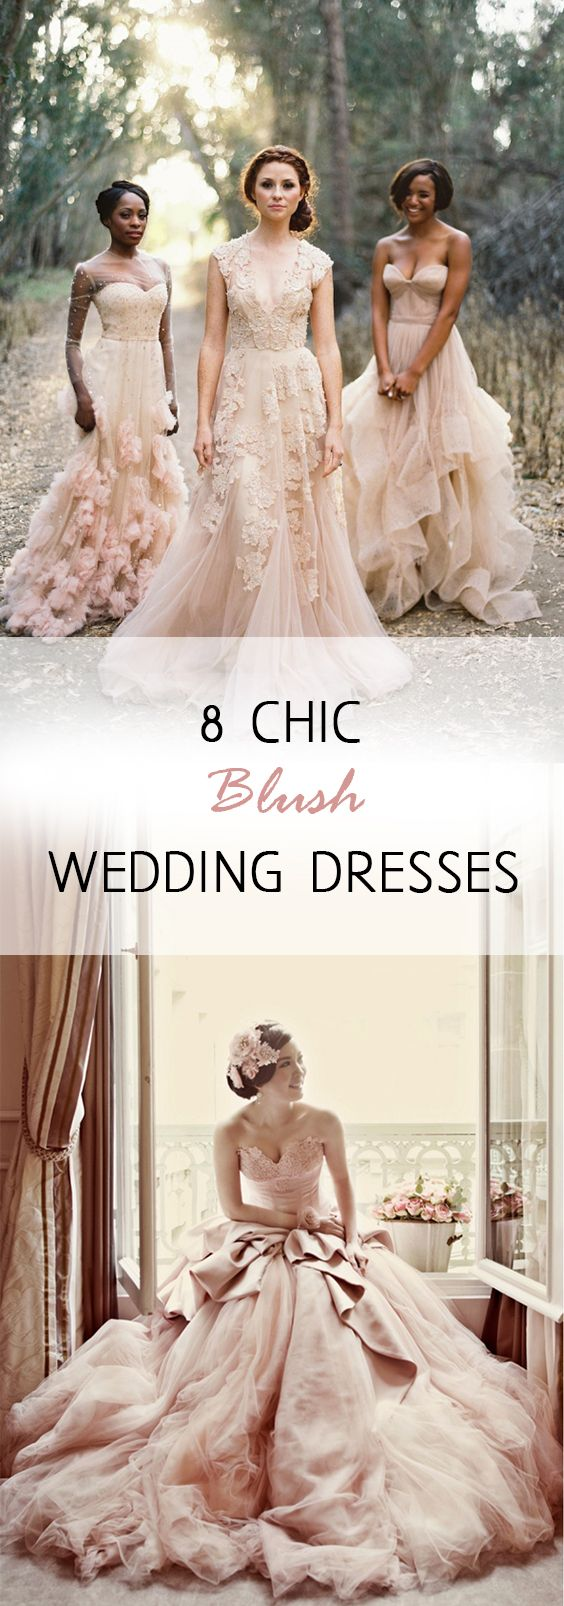 Wedding Dresses Dress Inspiration Hacks Color Schemes